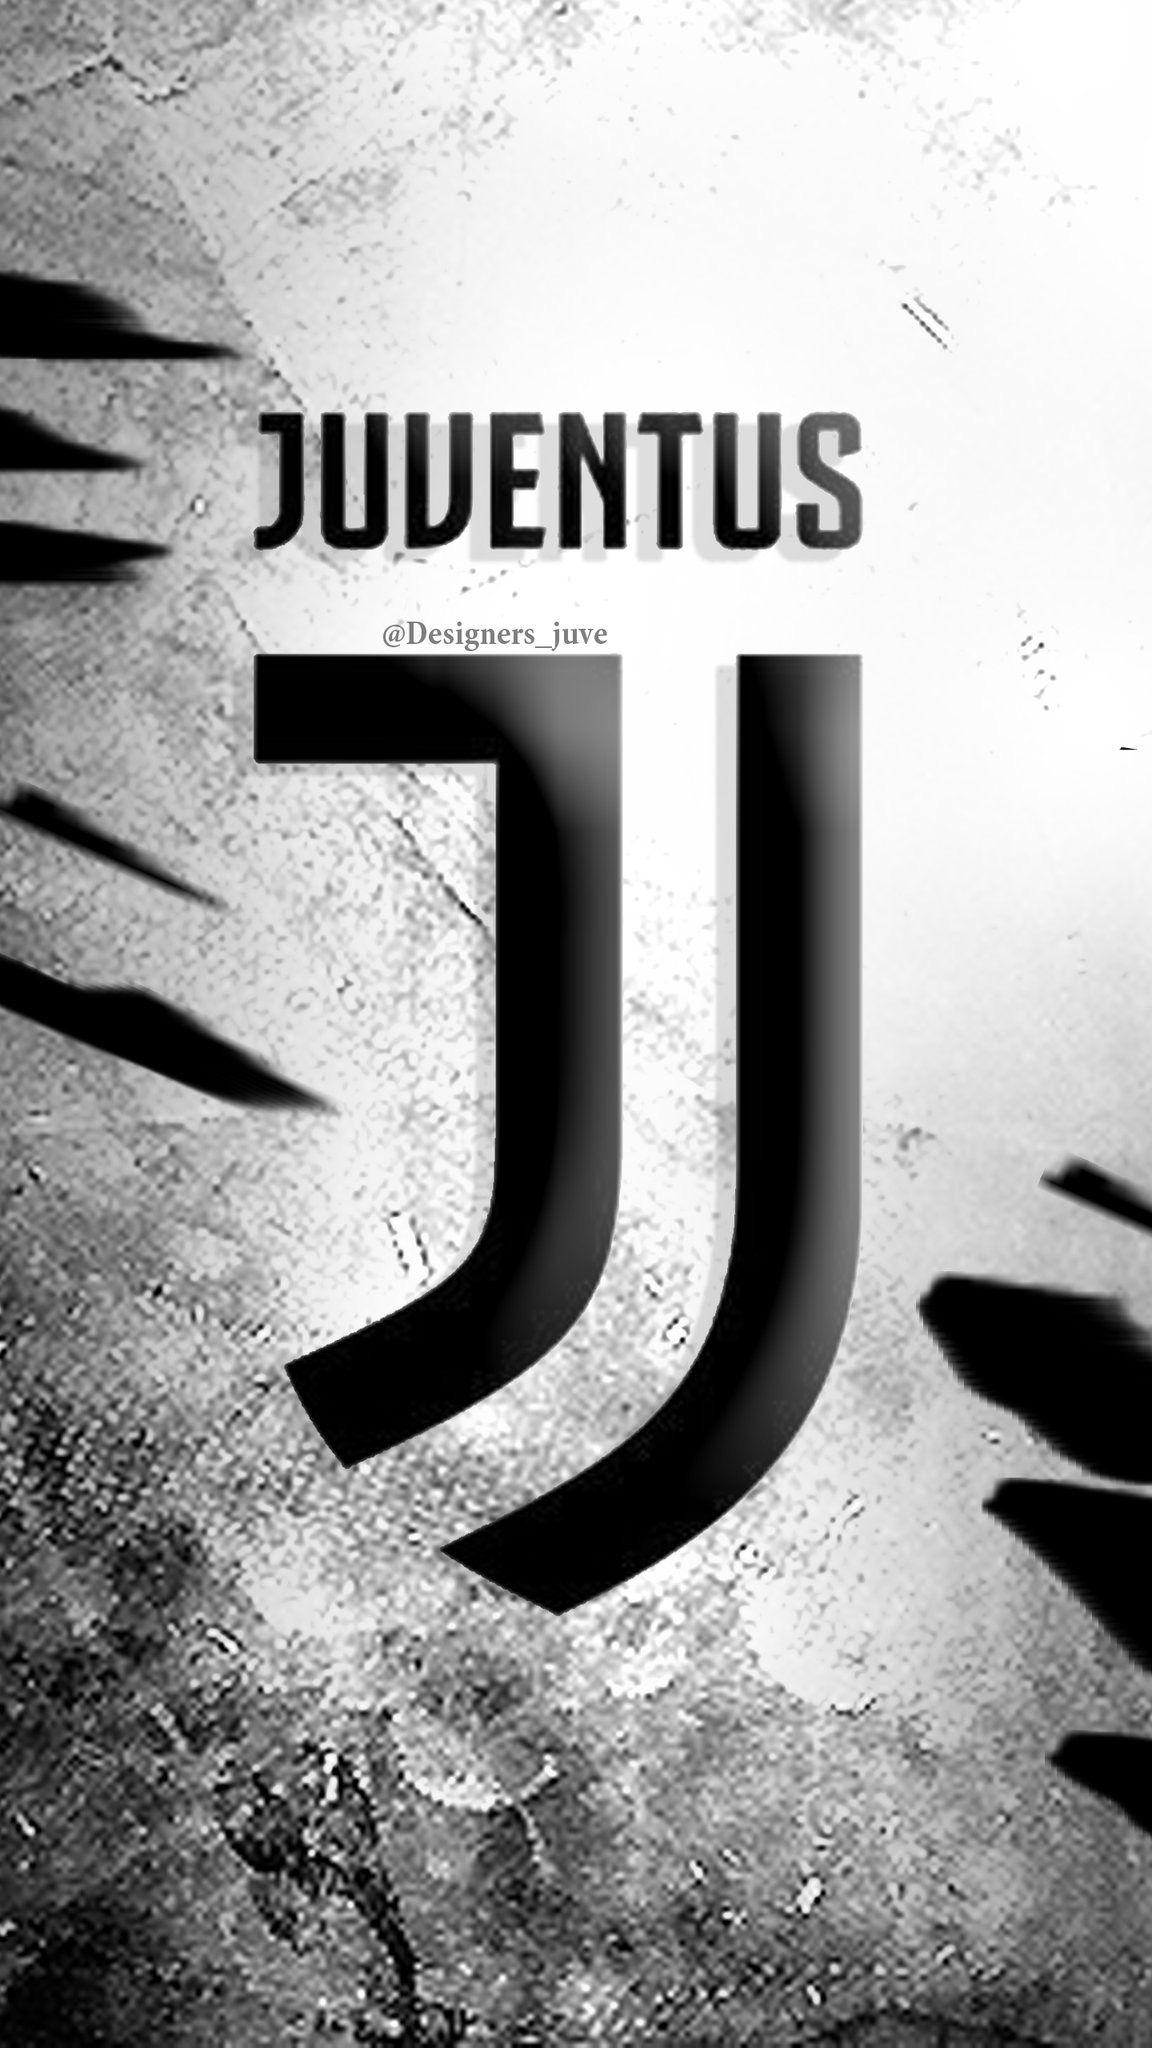 Juventus fondo